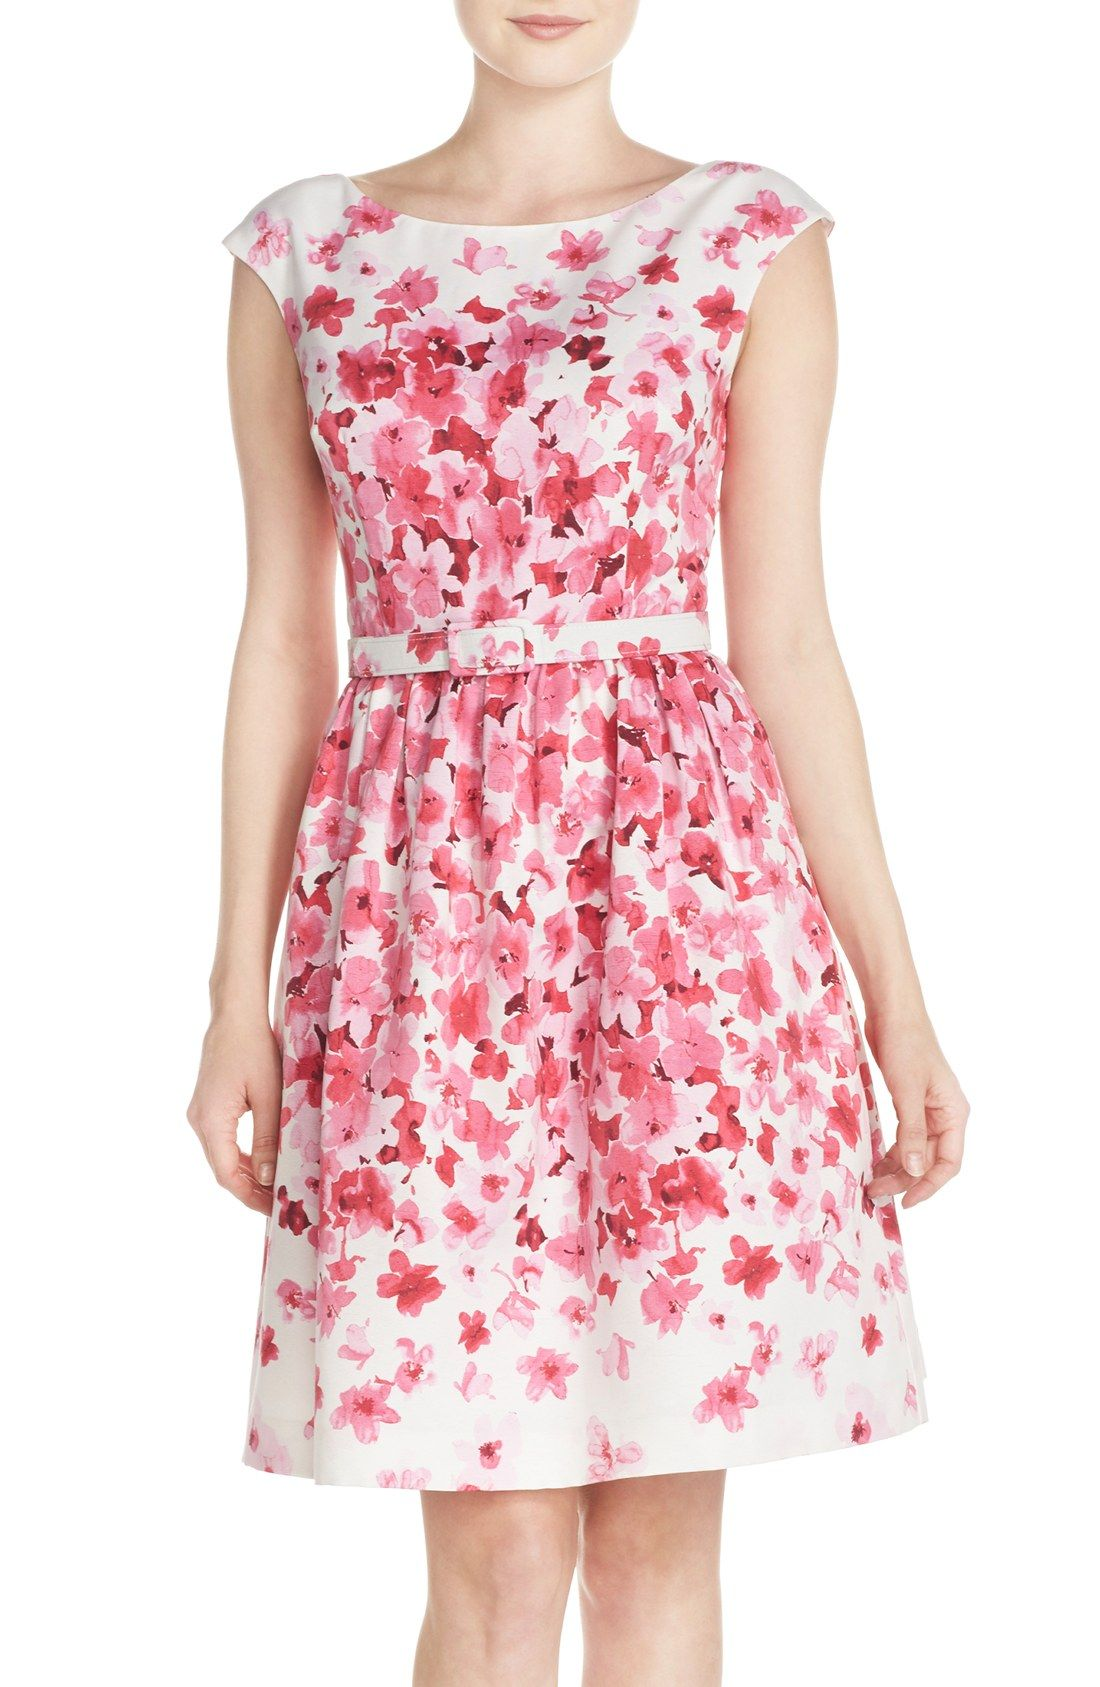 Sweet Pink Floral Faille Fit & Flare Dress   Dresses   Pinterest ...